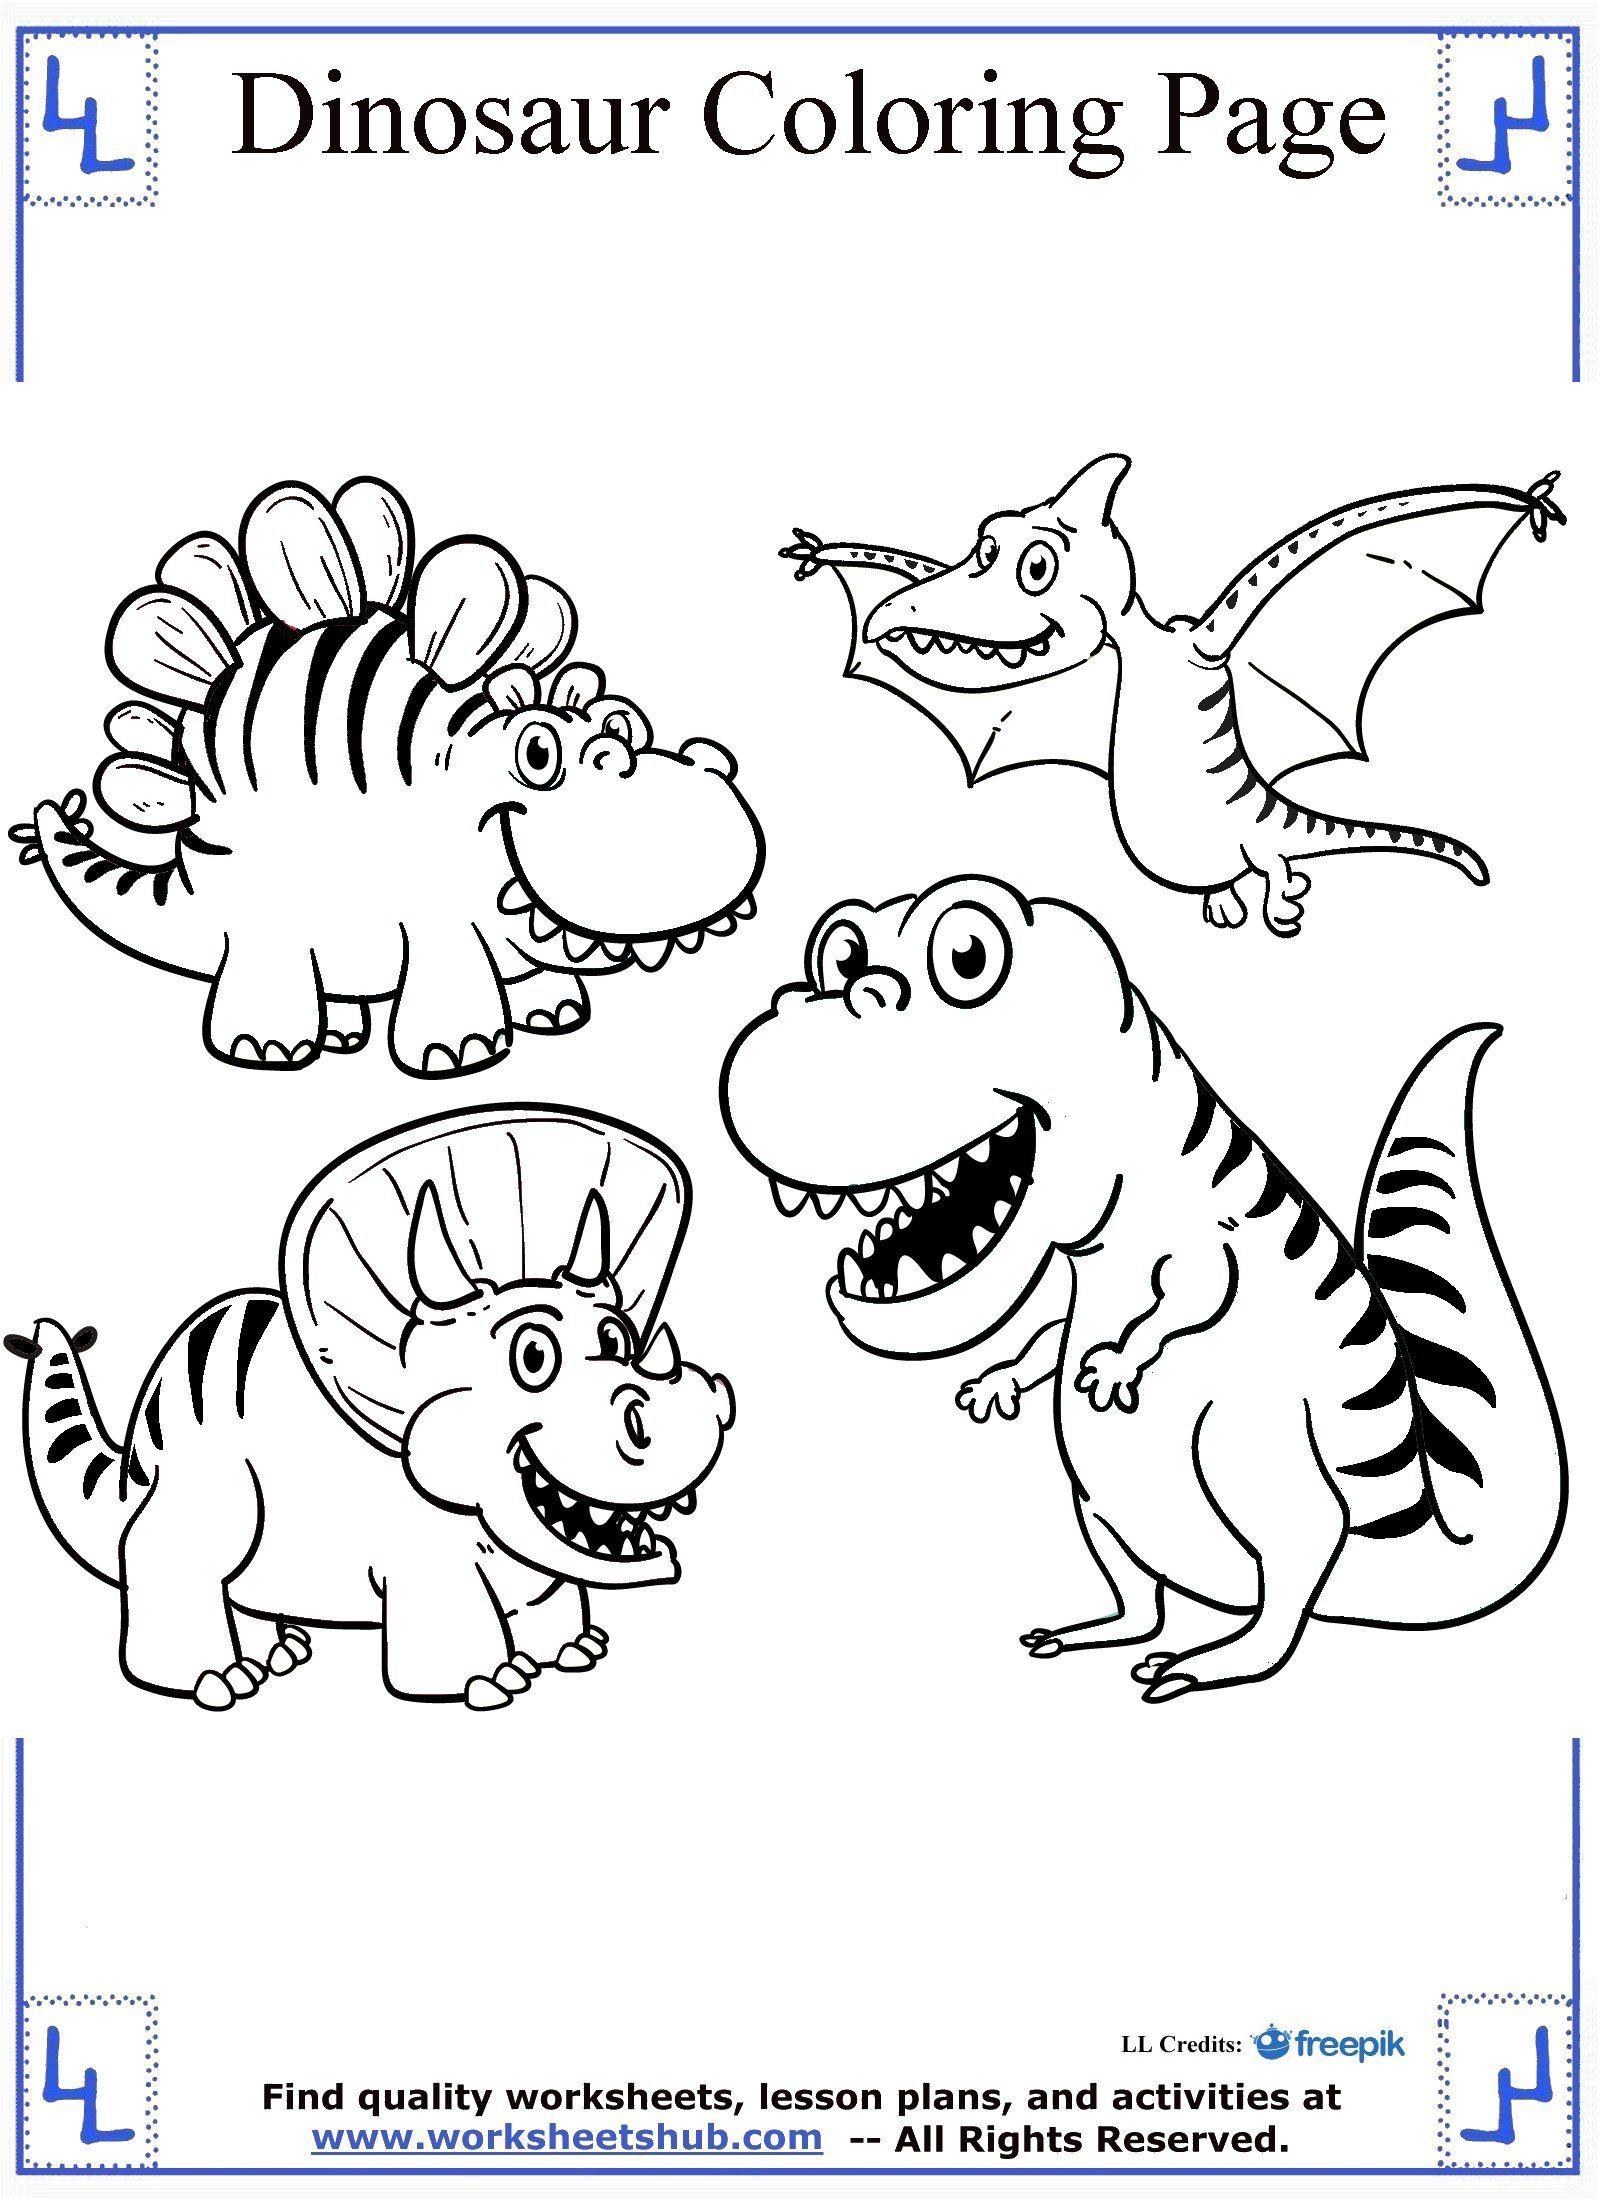 Cartoon Dinosaurs Coloring Page